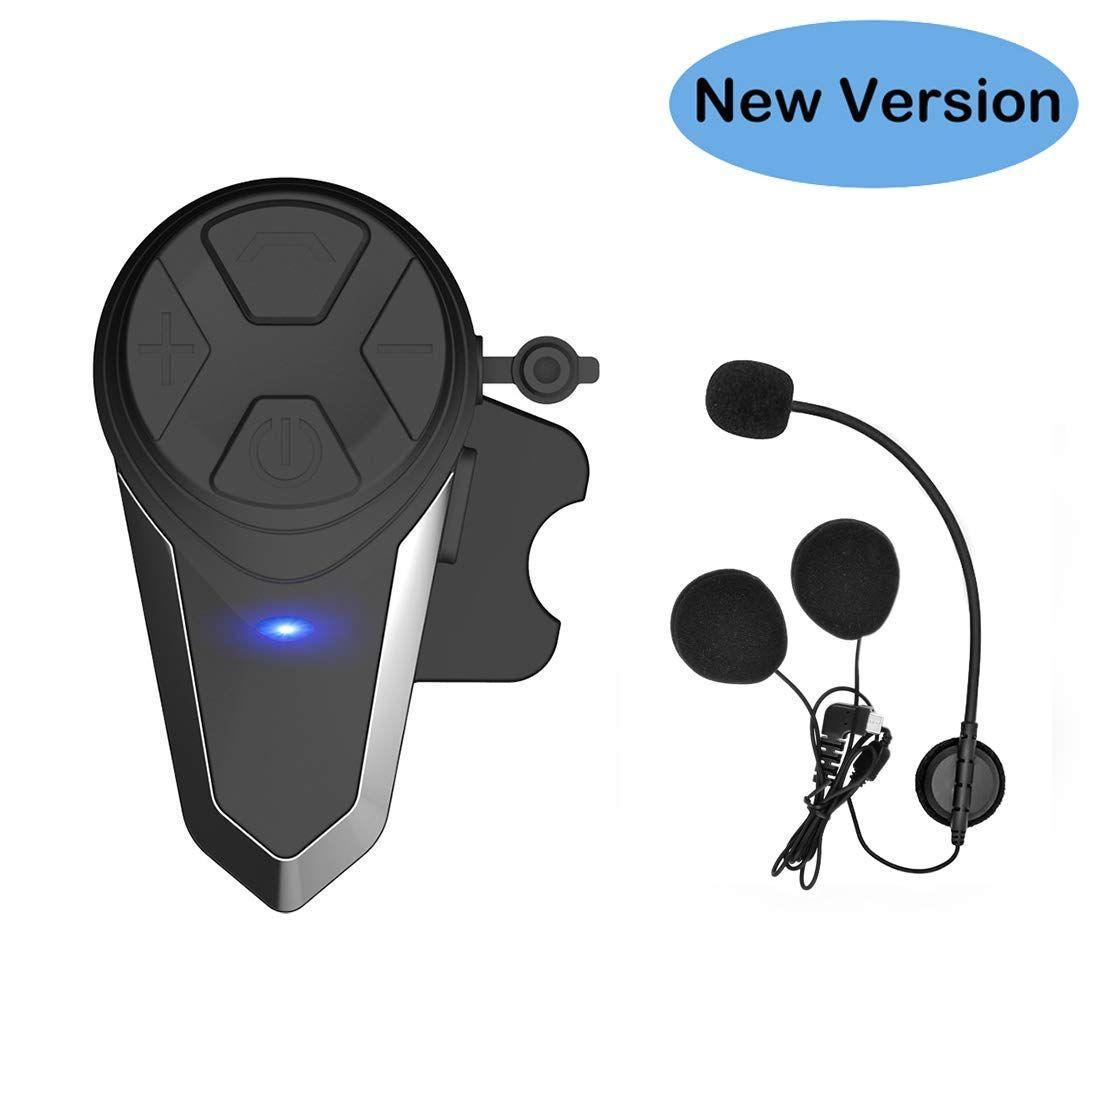 Thokwok Motorcycle Bluetooth Headset Bt S3 1000m Helmet Bluetooth Communication Systems Ski Helmet Headphones Bluetooth Headset Headphones Bluetooth Headphones